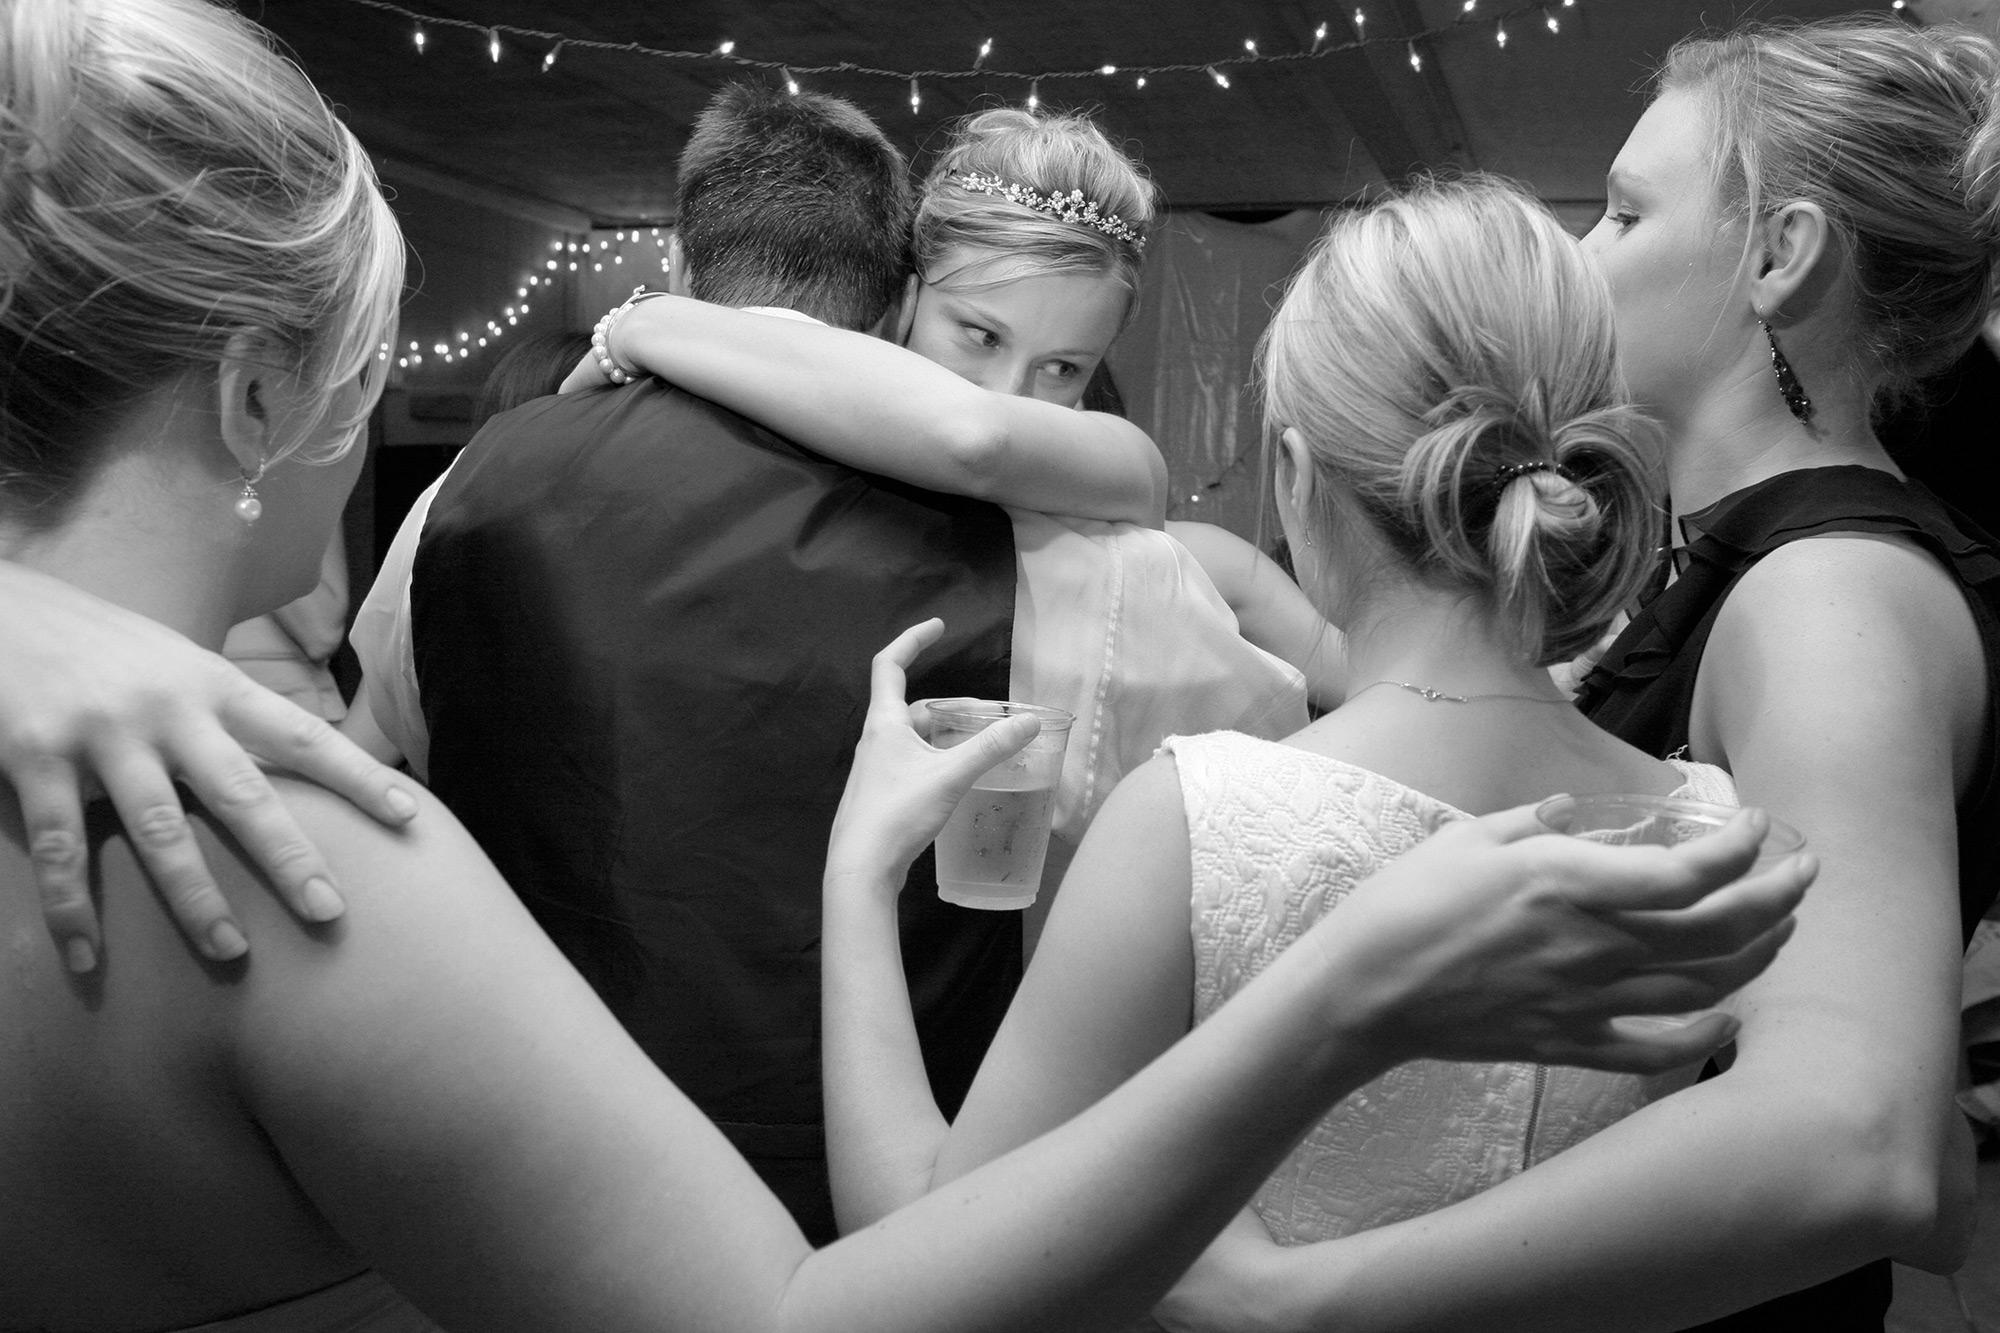 wedding-photography-saint-paul-mark-kegans-664.jpg